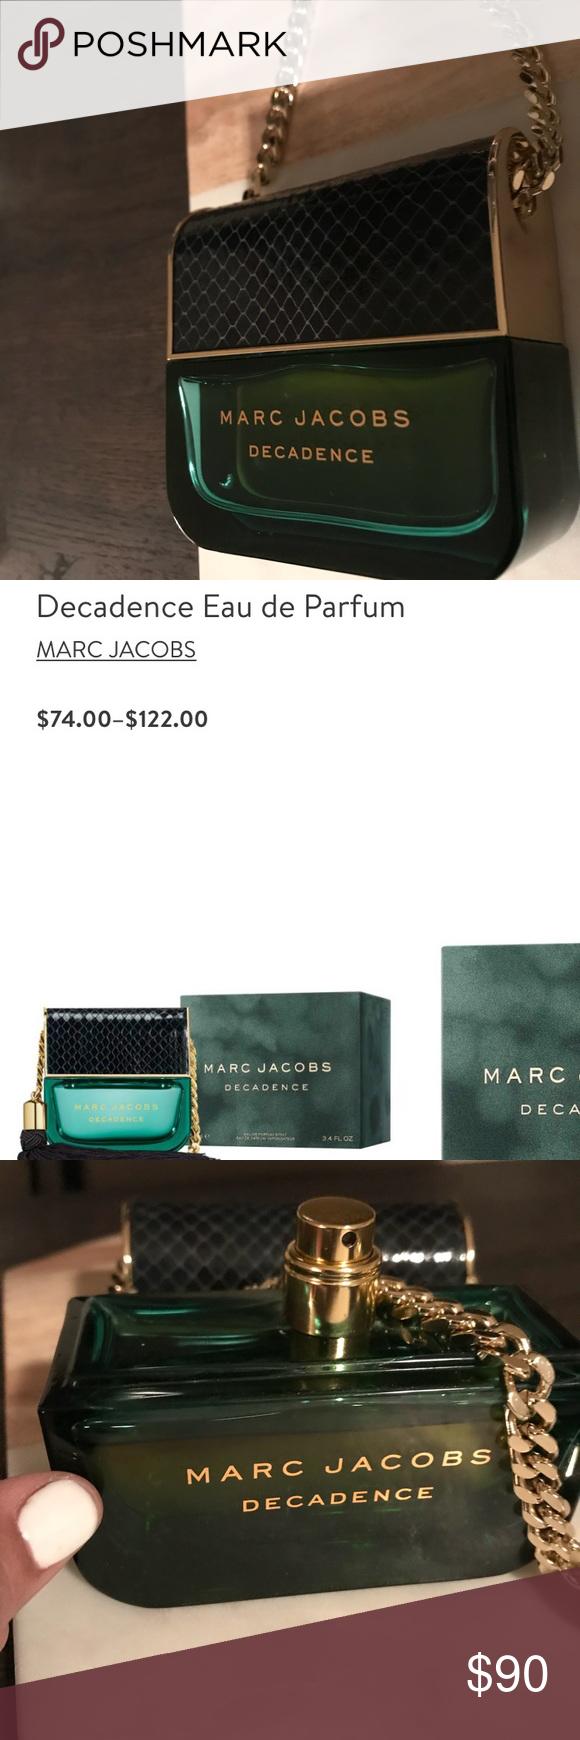 MARC JACOBS DECADENCE PERFUME 3.2 oz pretty much brand new